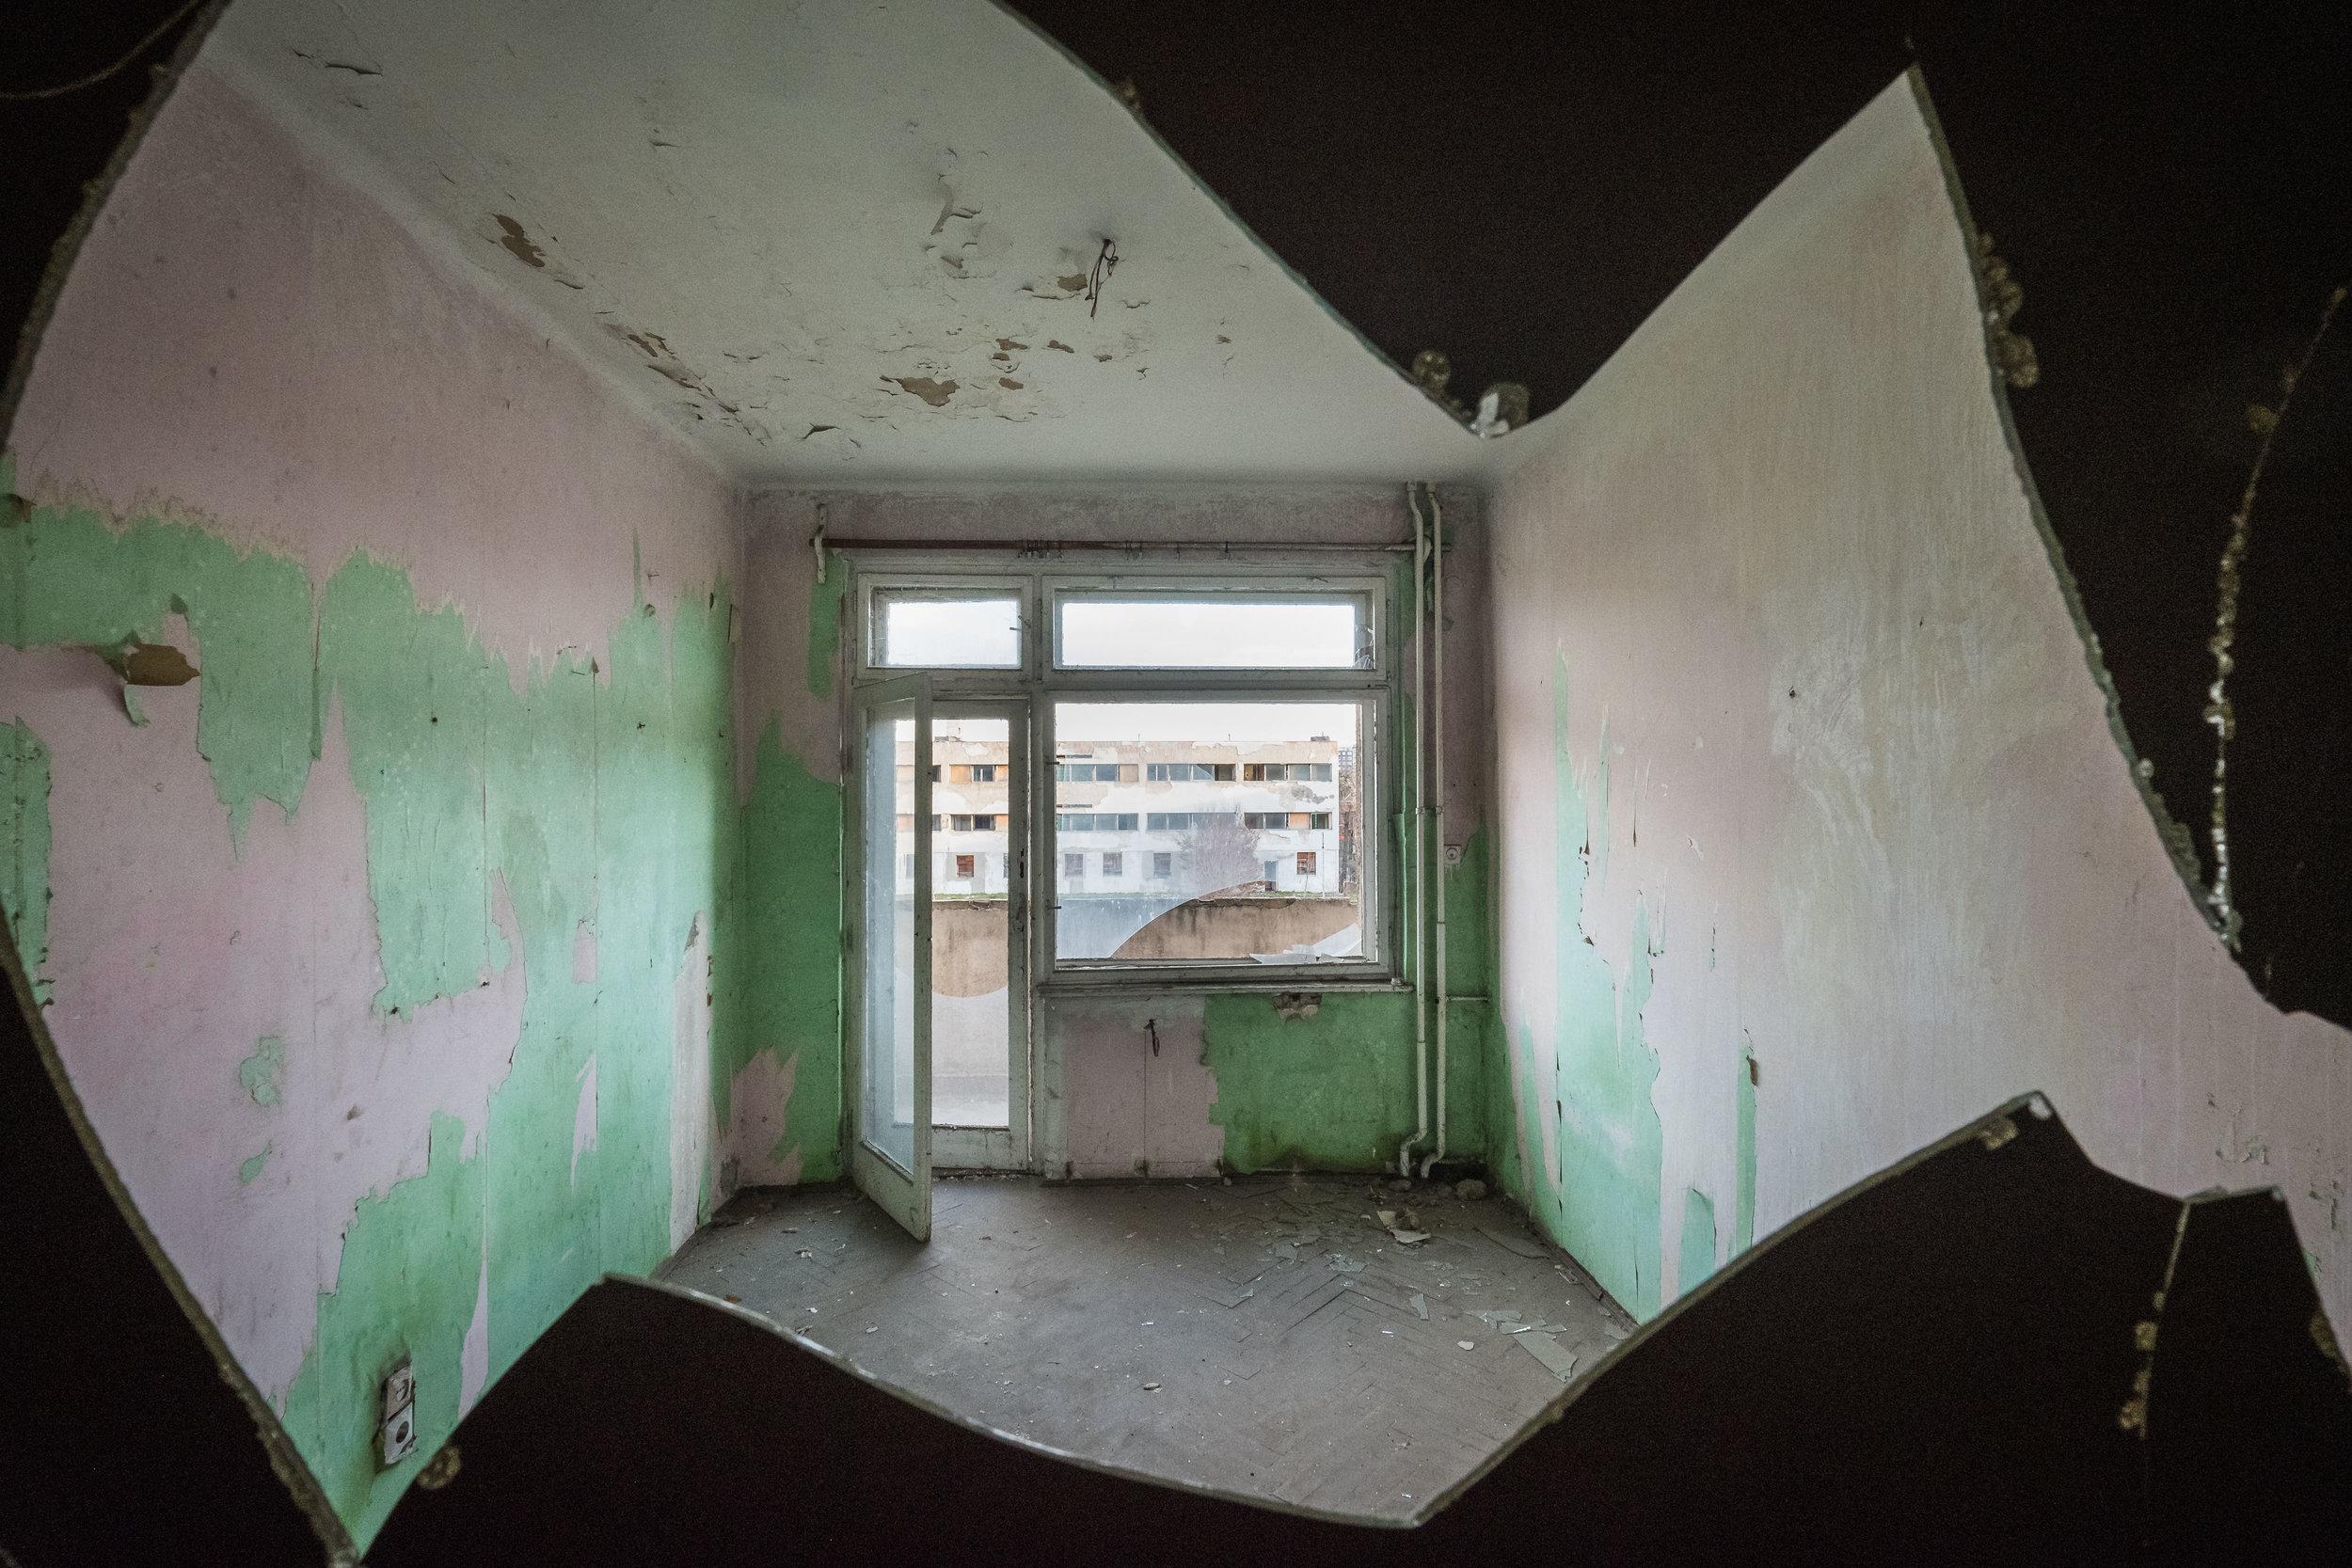 budapest hospital_2-9.jpg